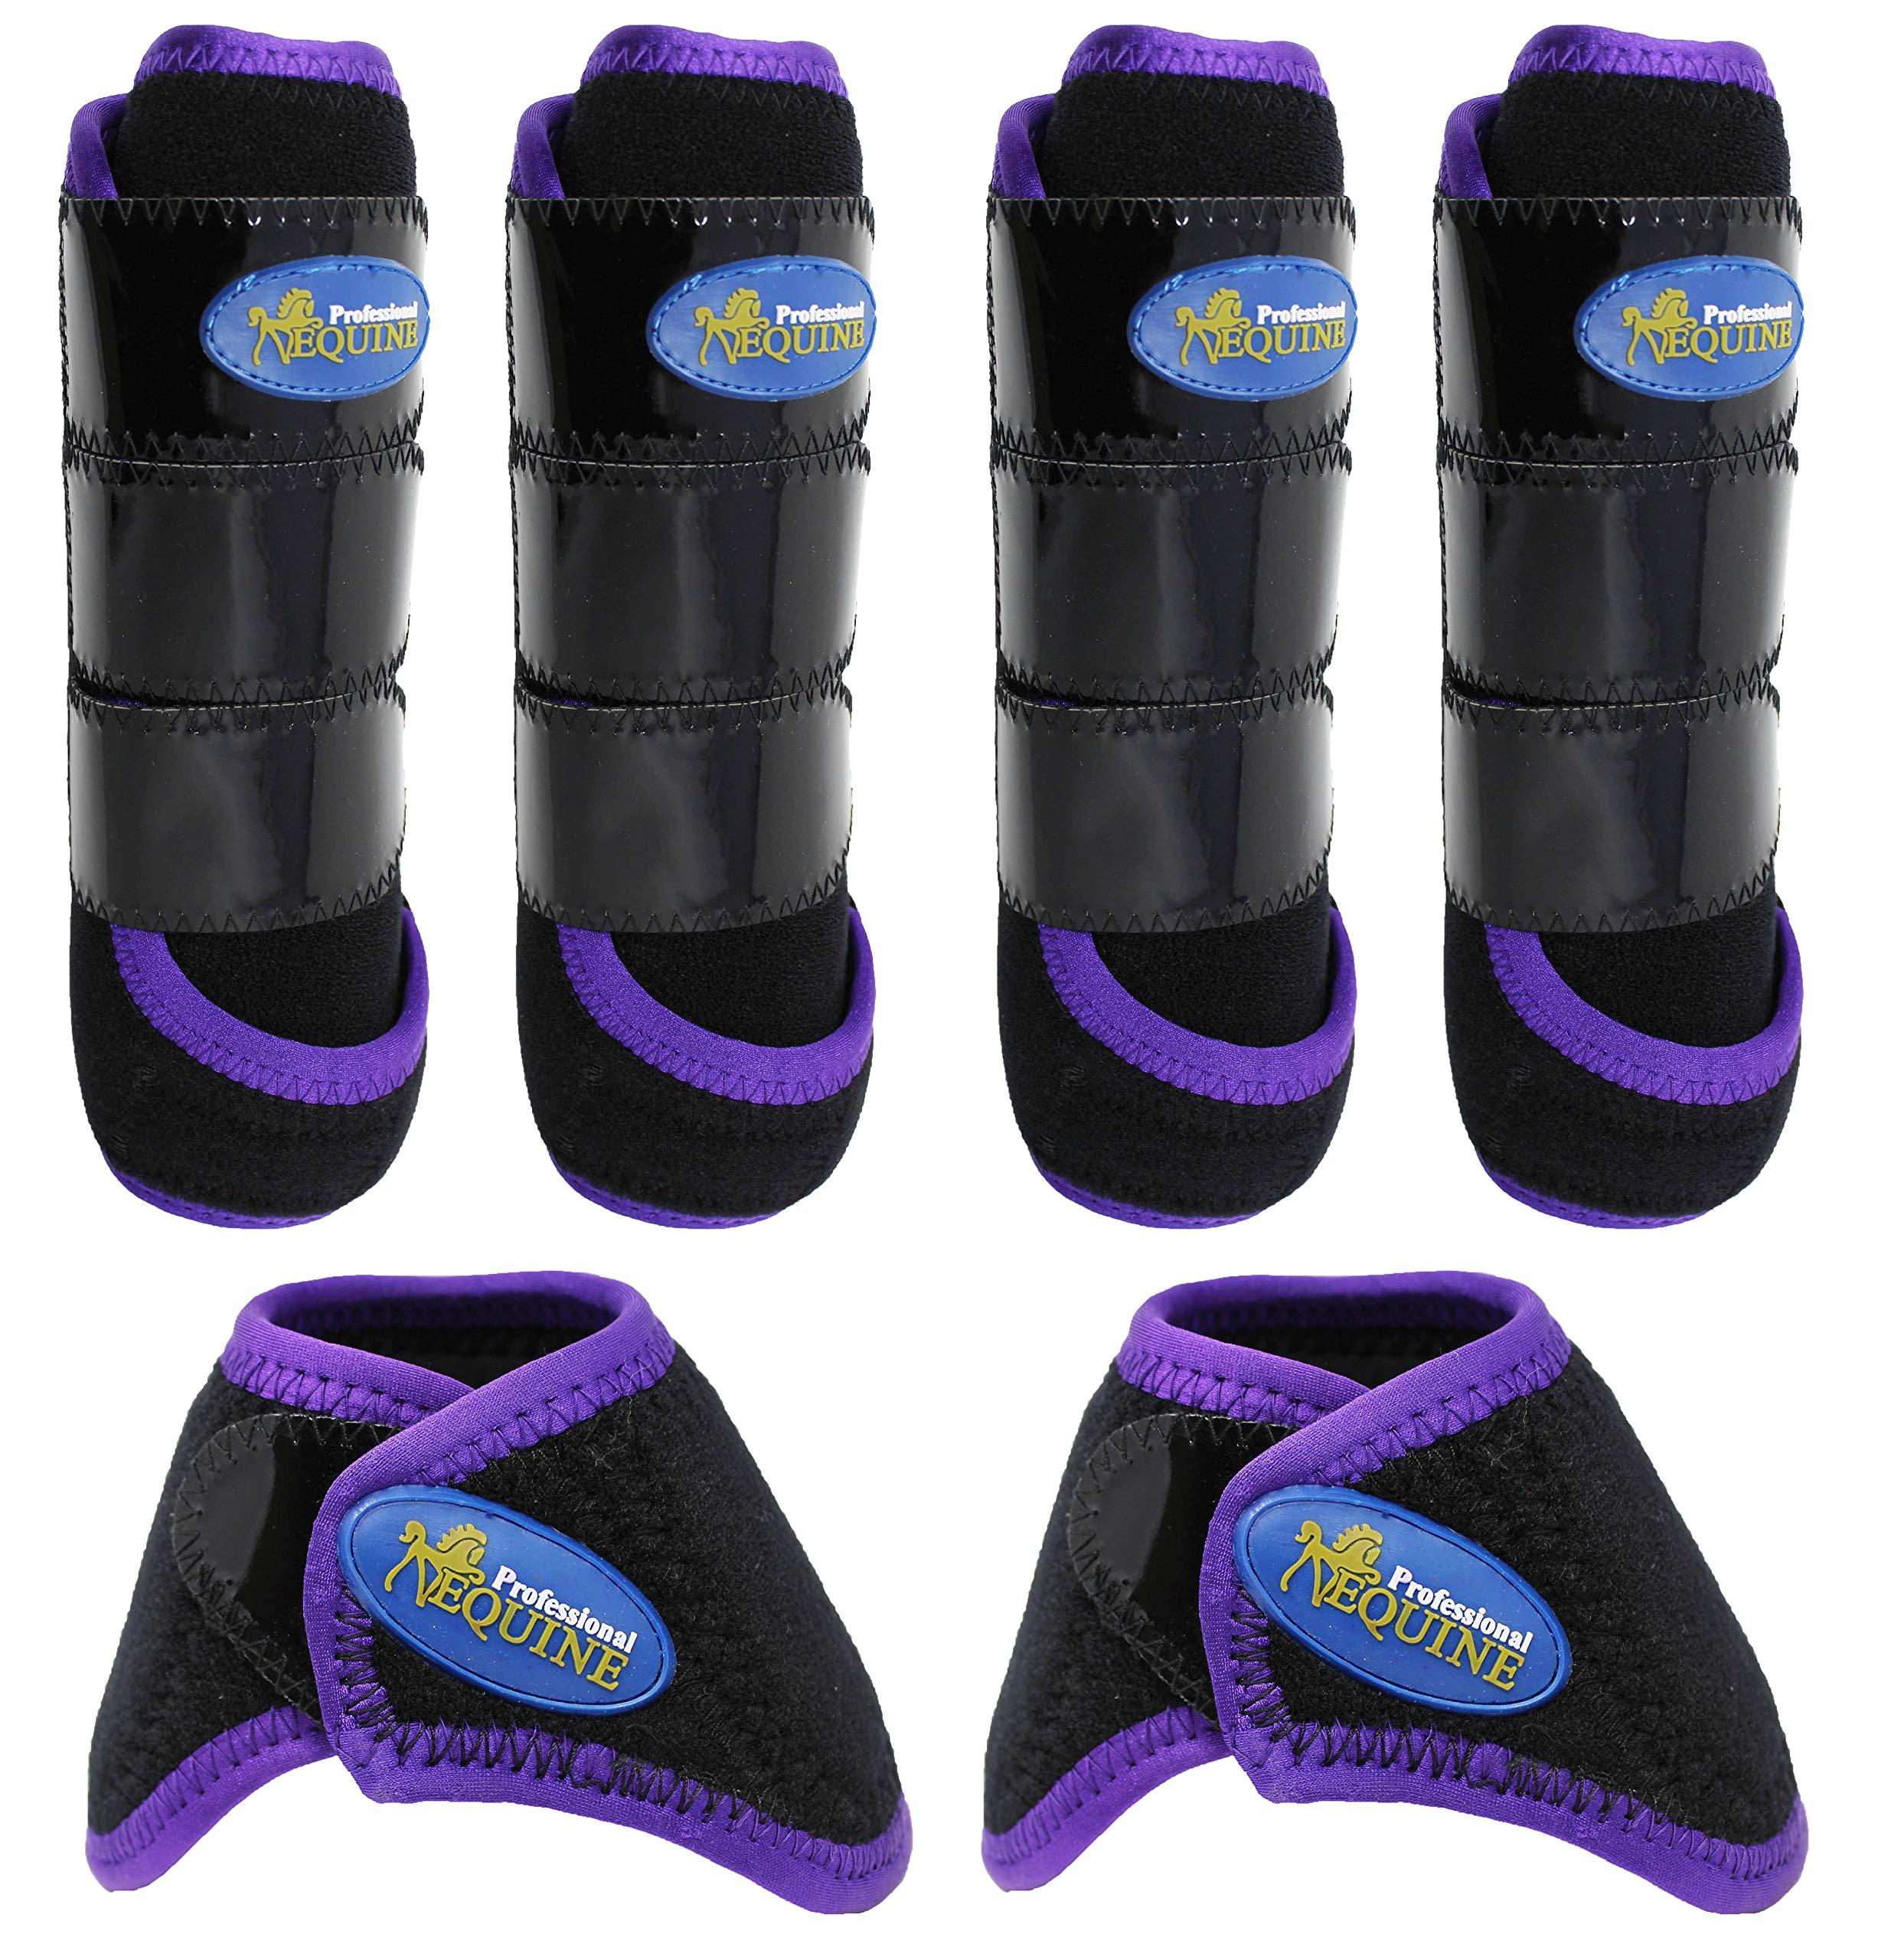 Professional Equine Horse Medium 4-Pack Sports Medicine Splint Bell Boots 4166D